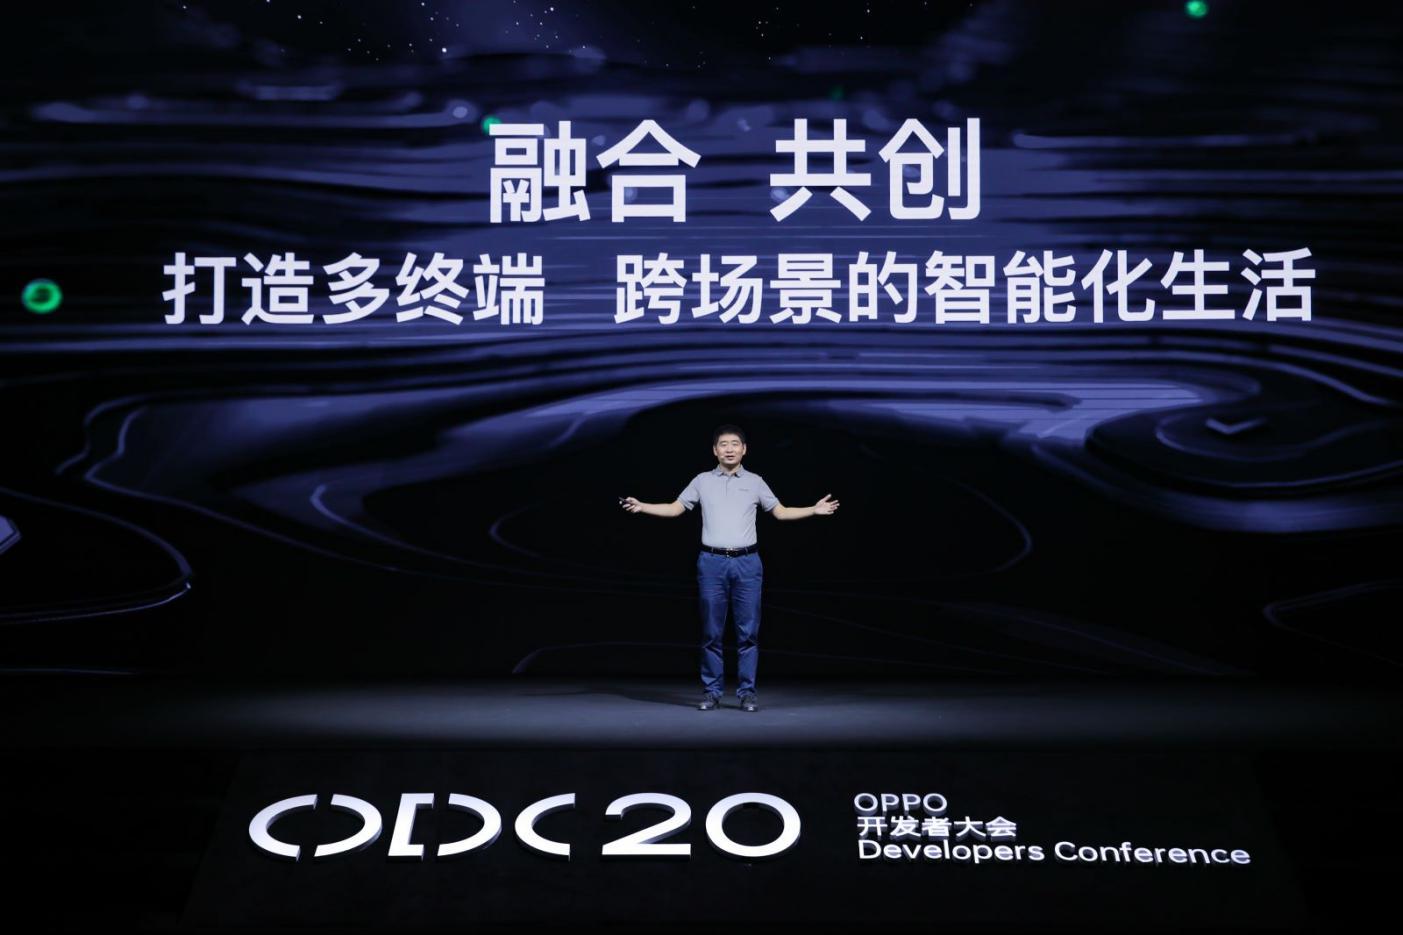 OPPO副总裁、互联网事业部总裁段要辉